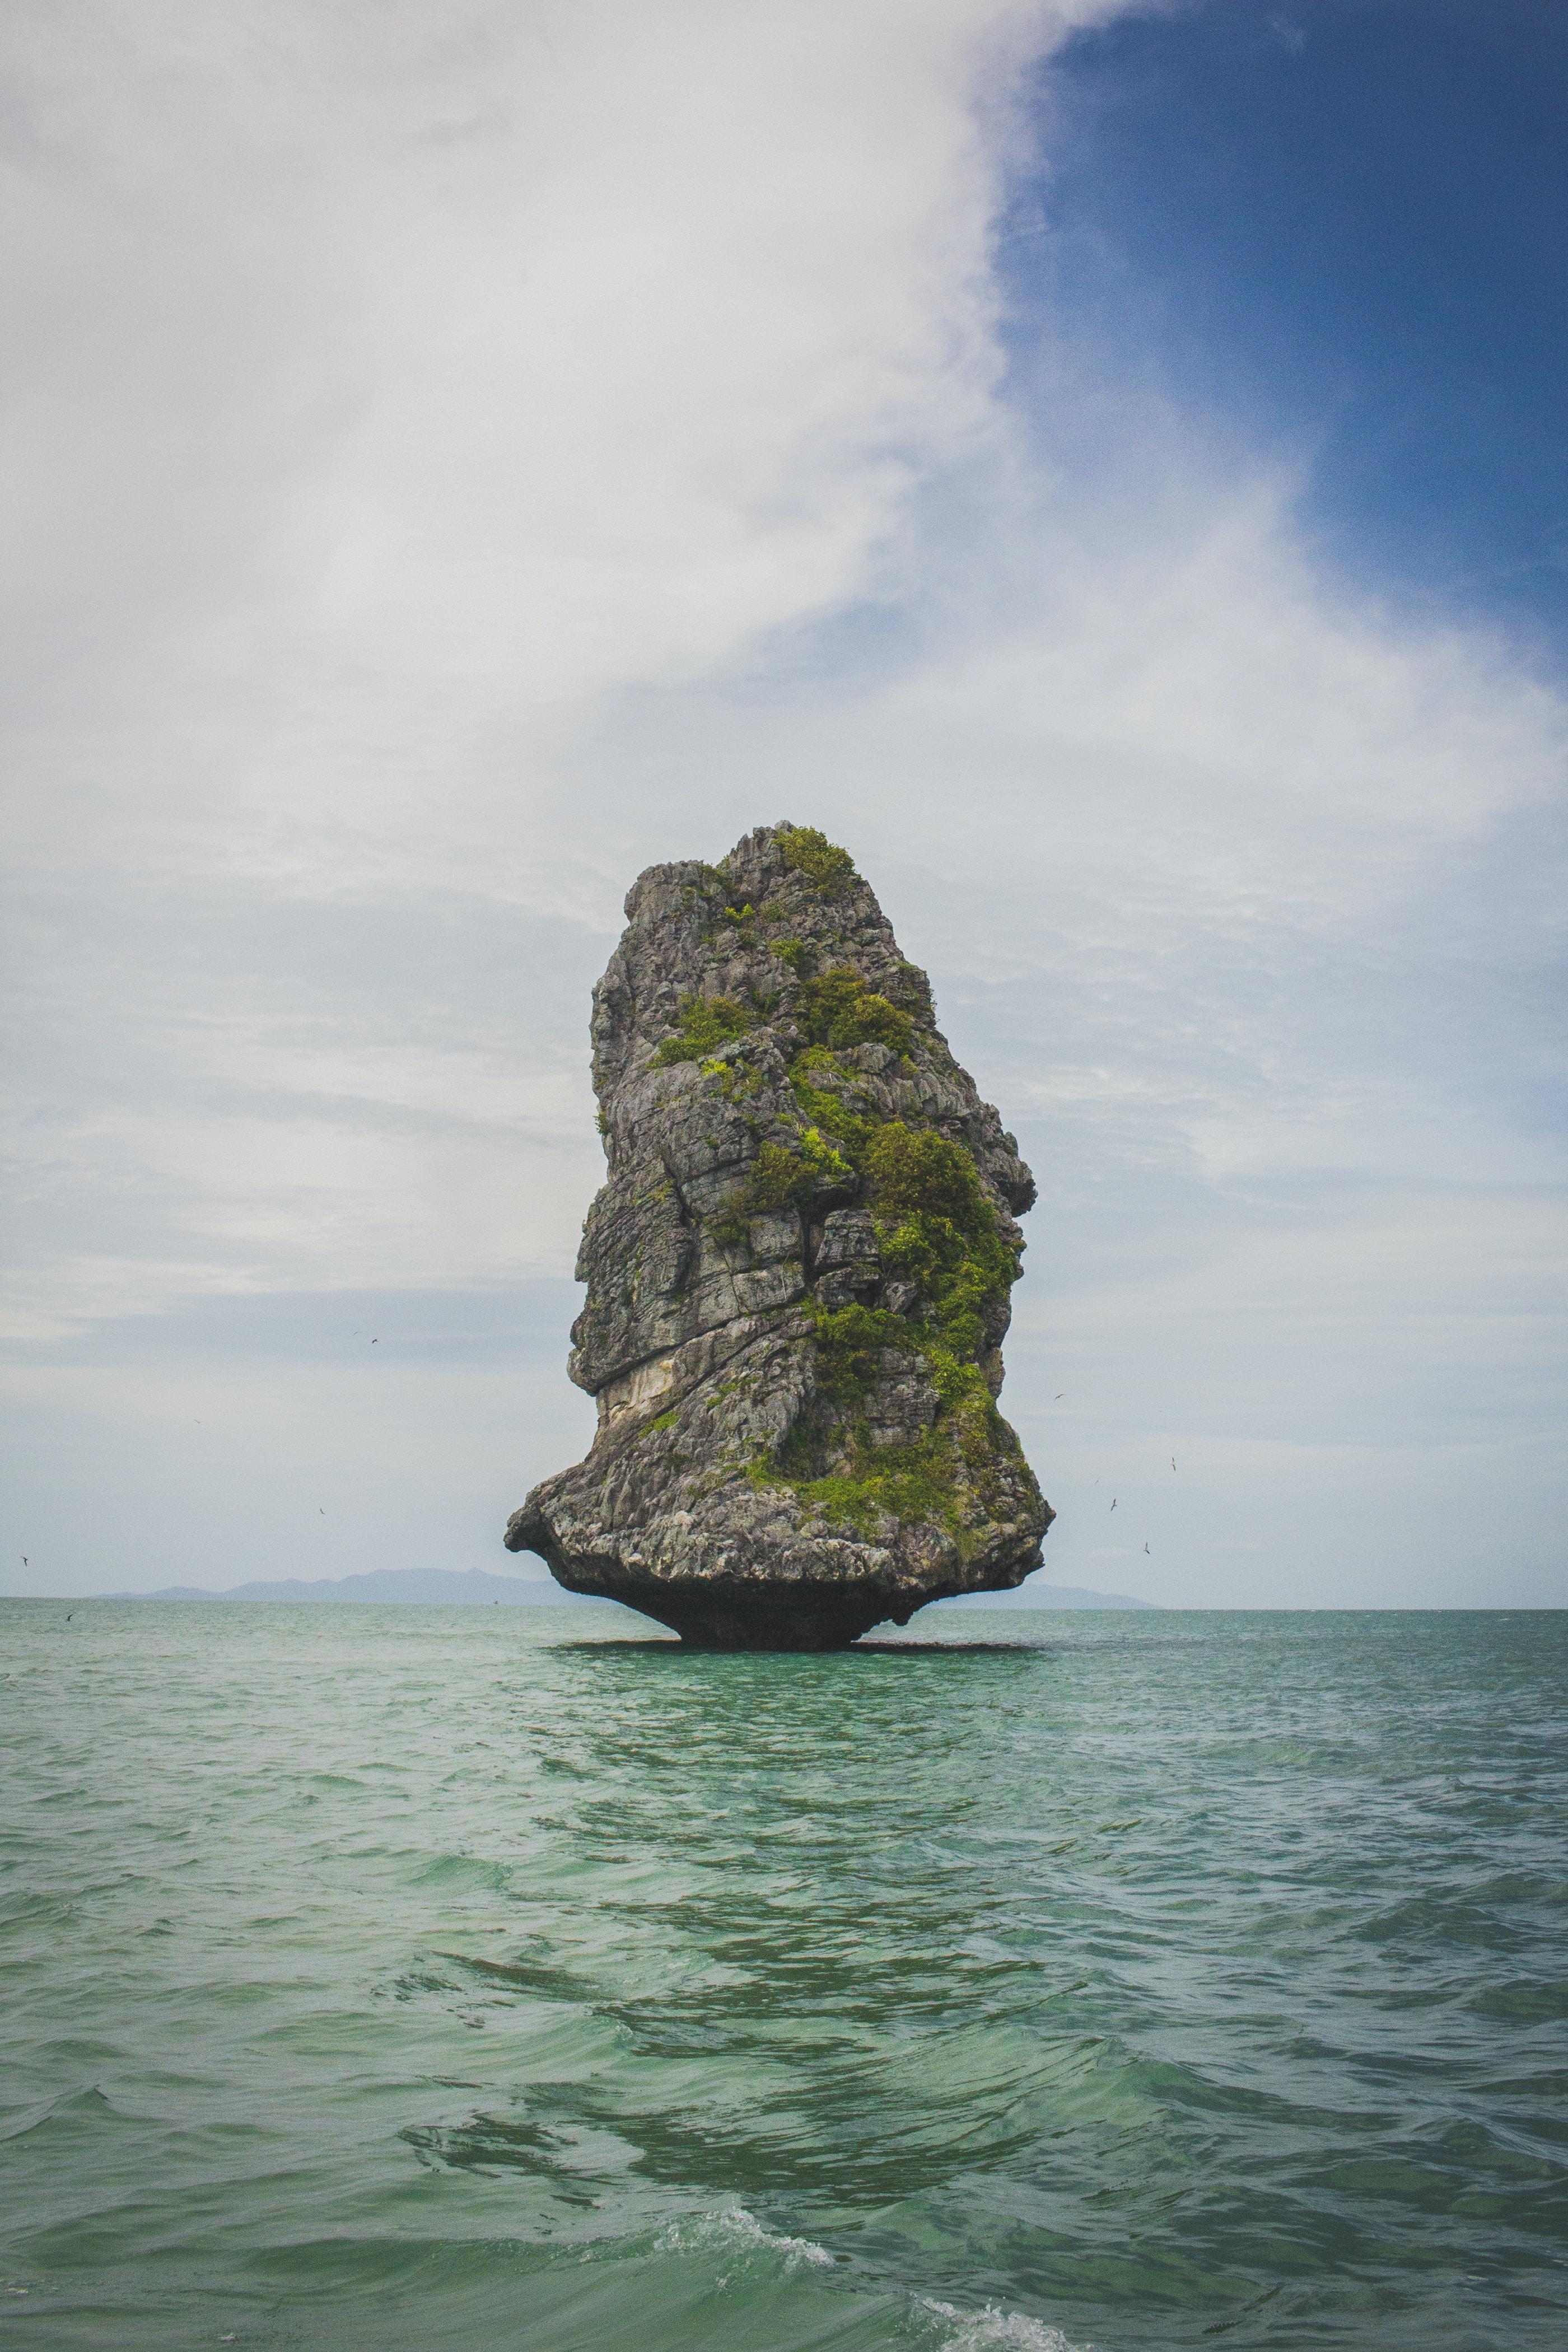 rock island on sea